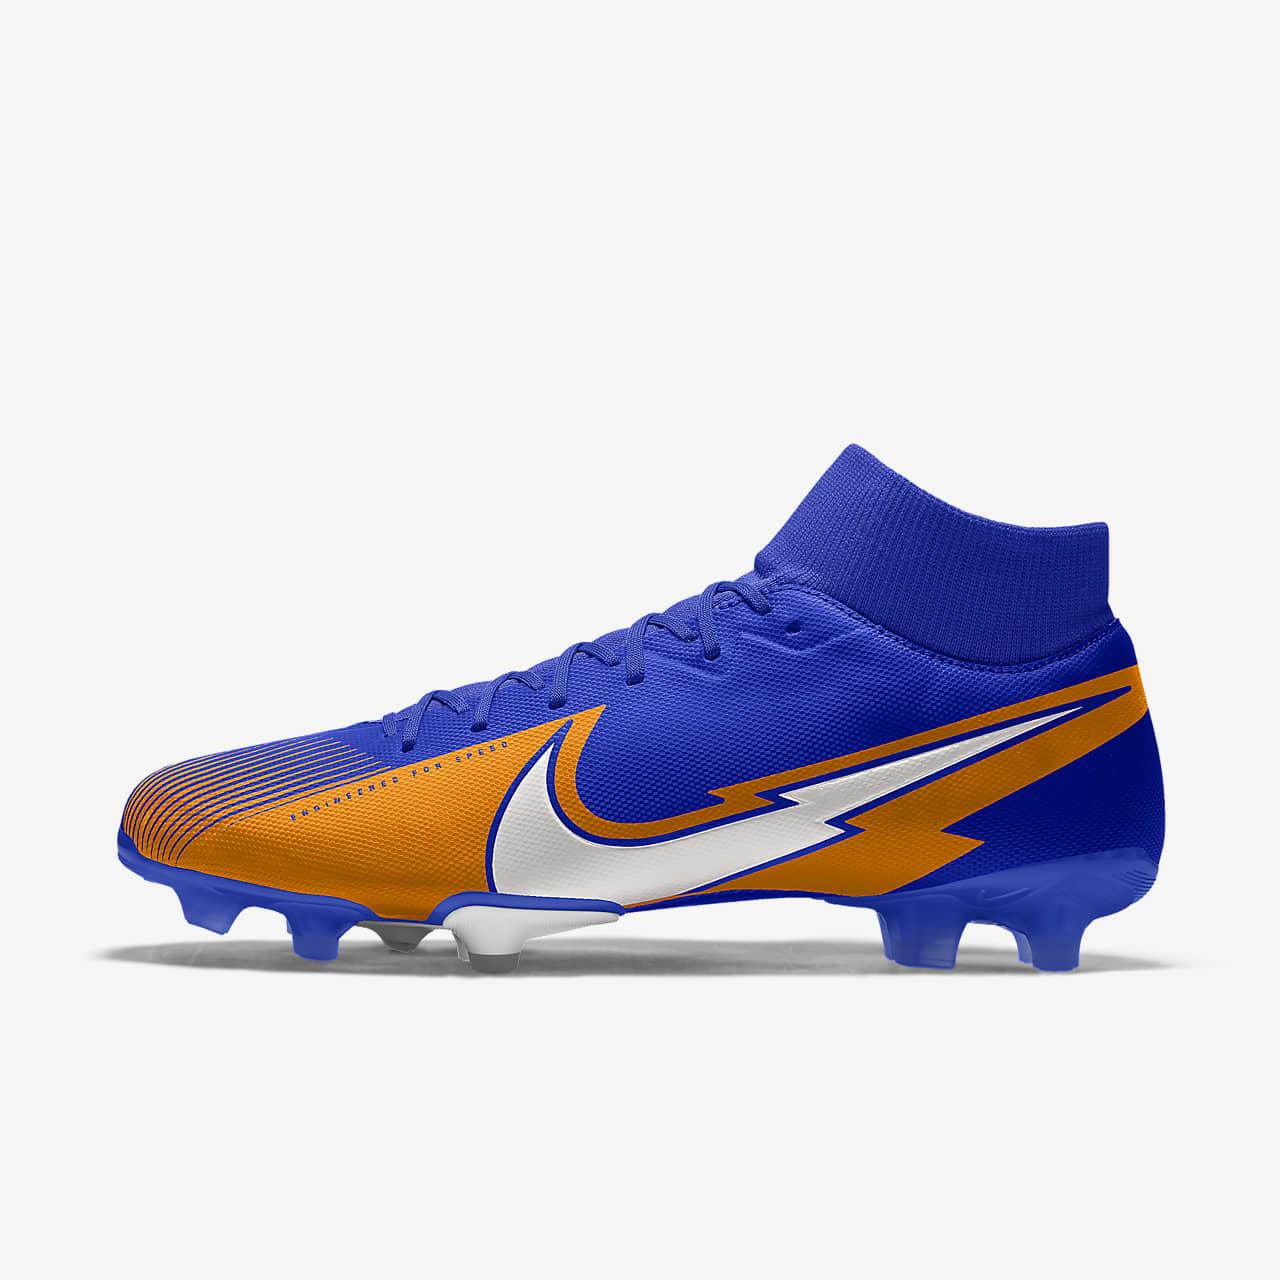 Nike Mercurial Superfly 7 Academy By You Custom Football Boot